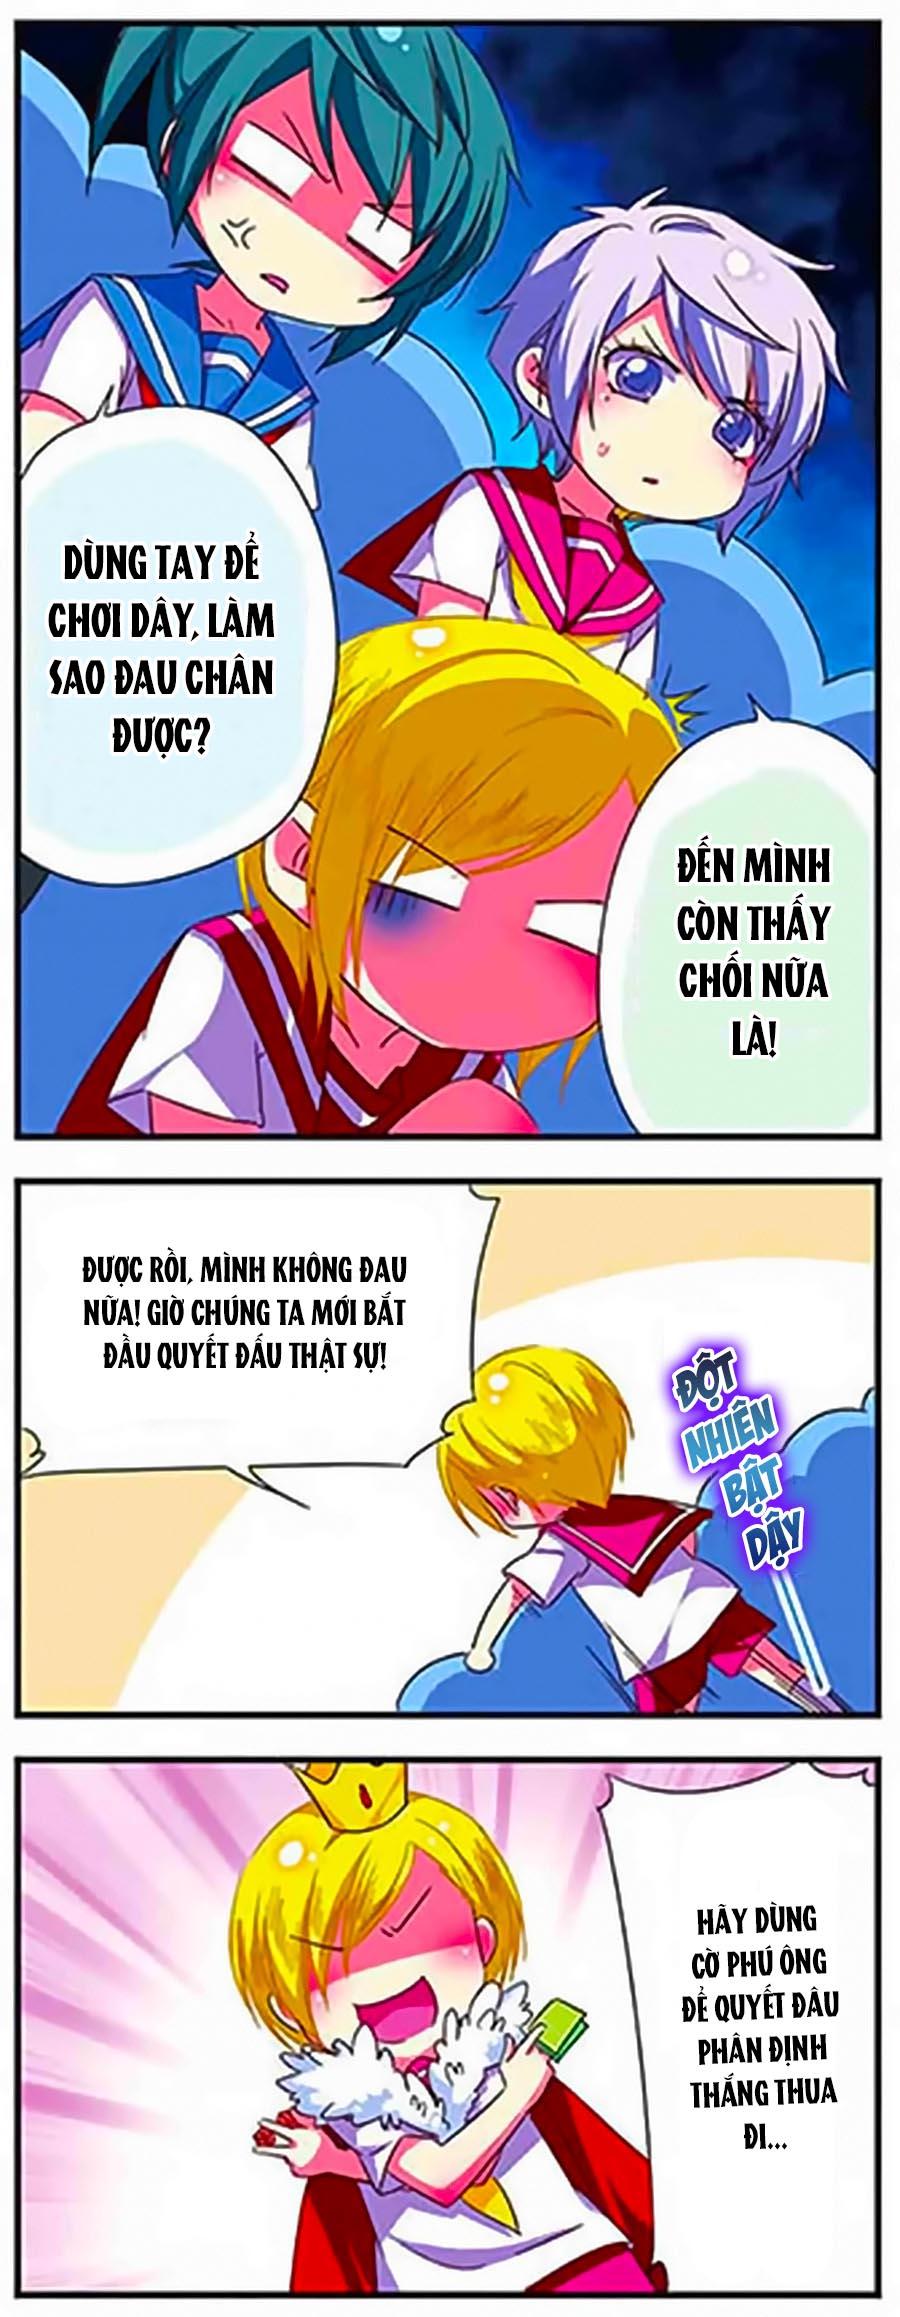 Manh Tam Quốc Chap 108 - Next Chap 109